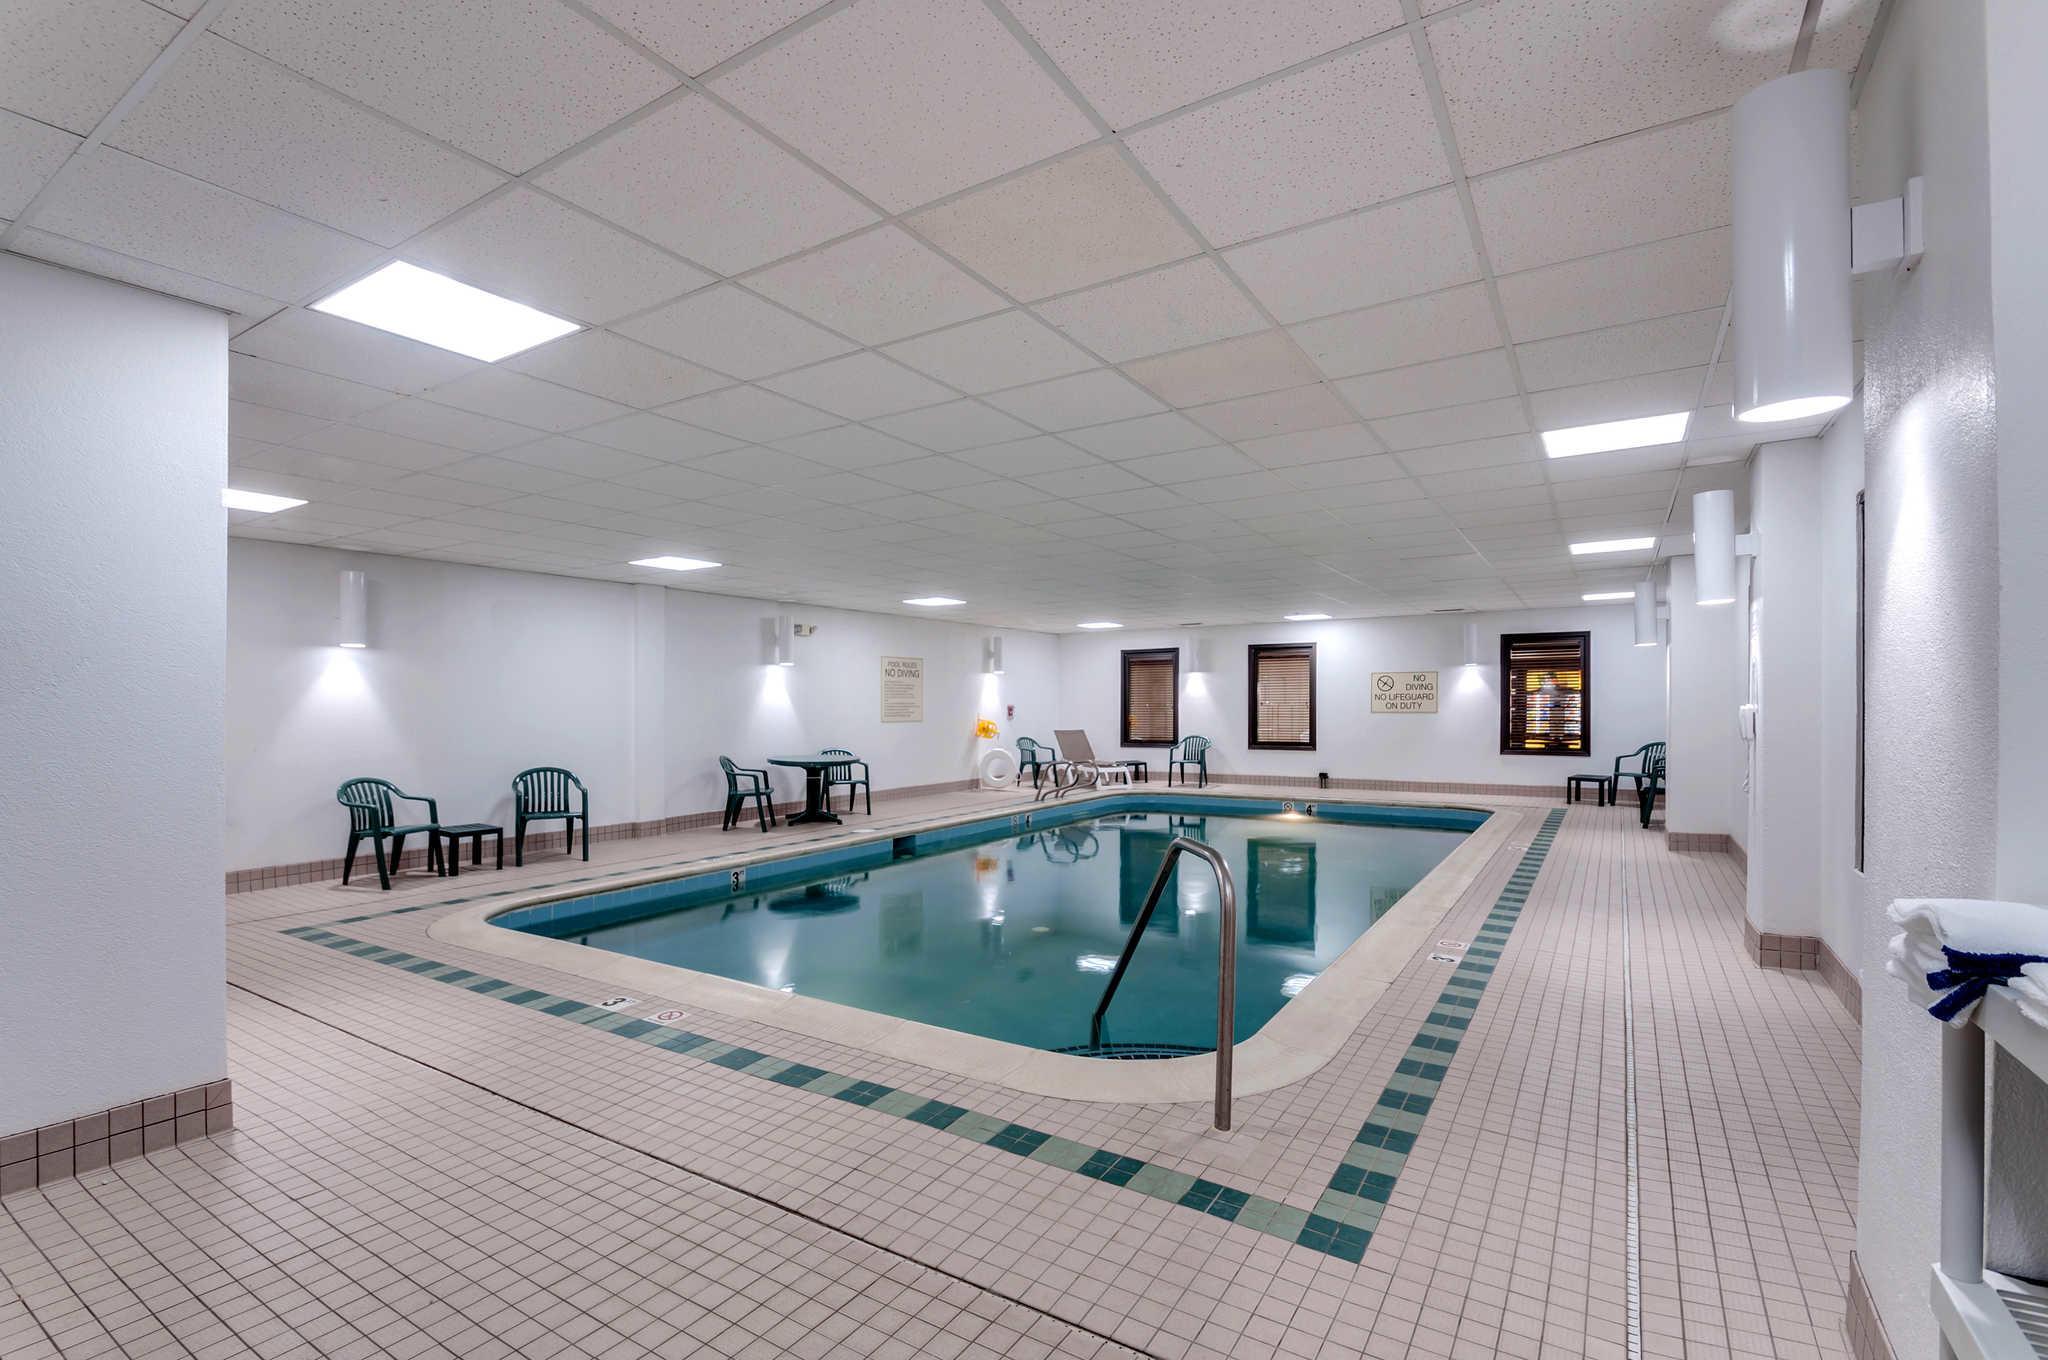 Comfort Inn & Suites Edgewood - Aberdeen image 23